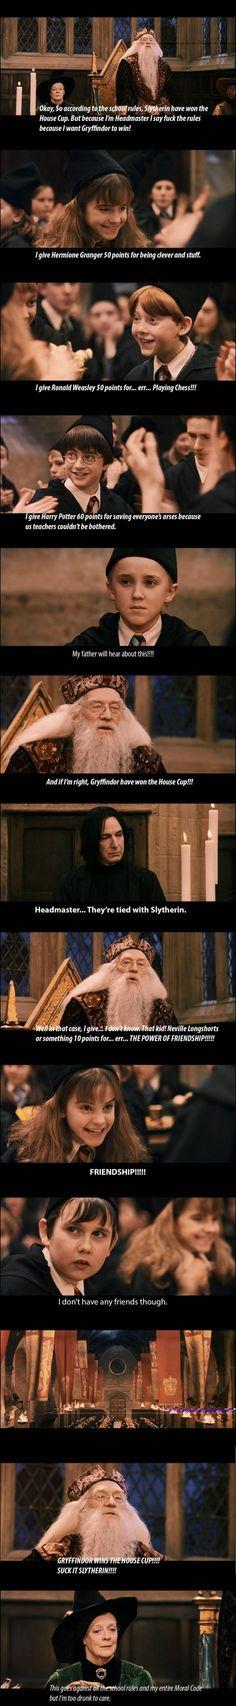 Dumbledore hates Slytherin